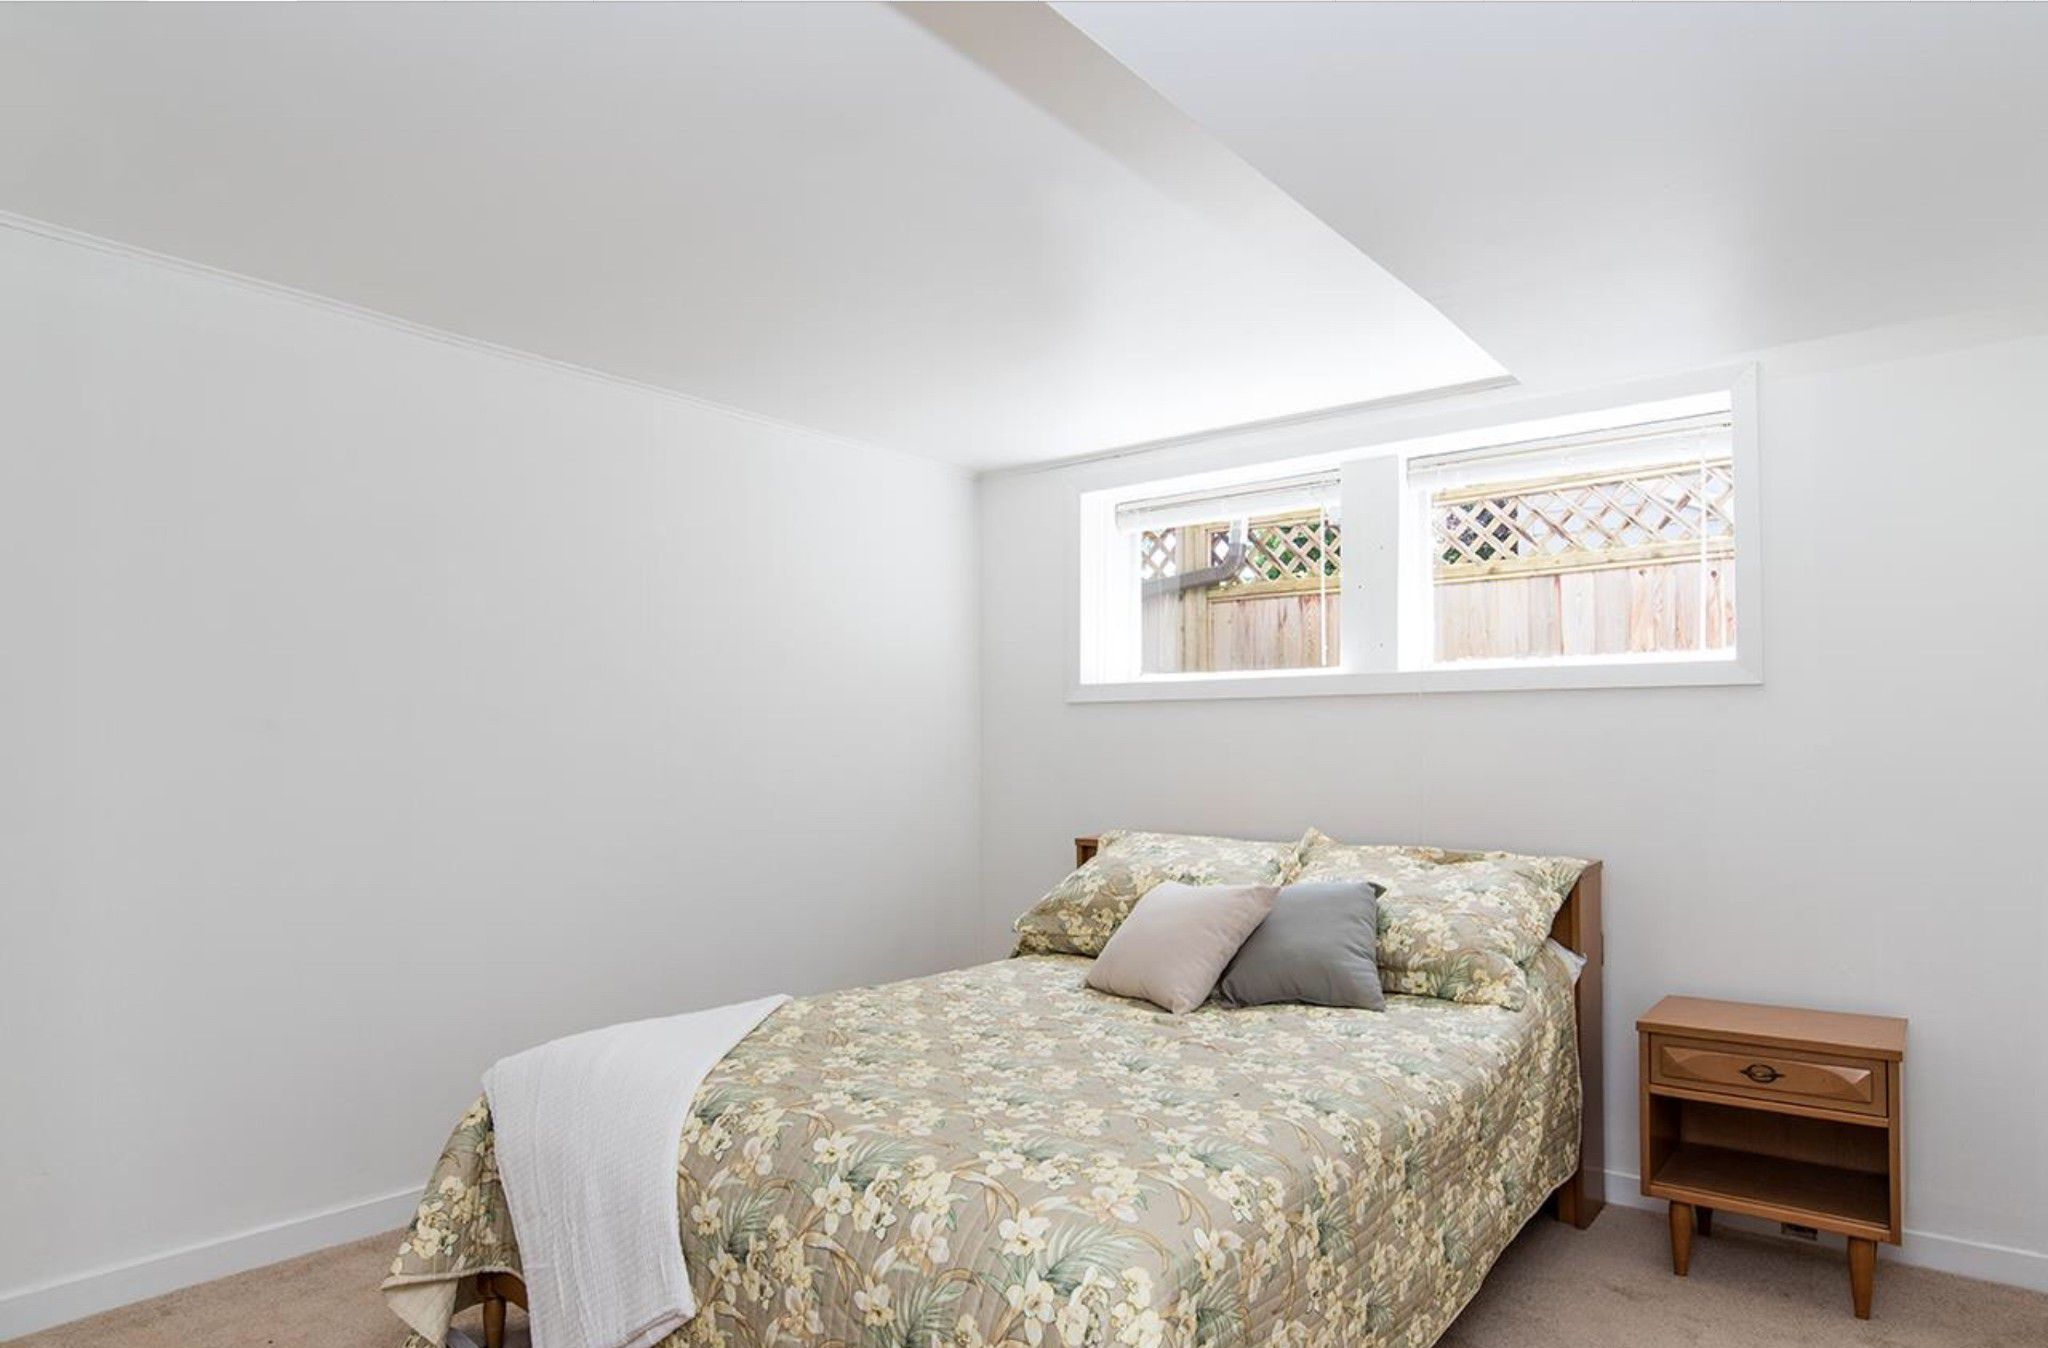 Photo 14: Photos: 10327 127A Street in Surrey: Cedar Hills House for sale : MLS®# R2178137